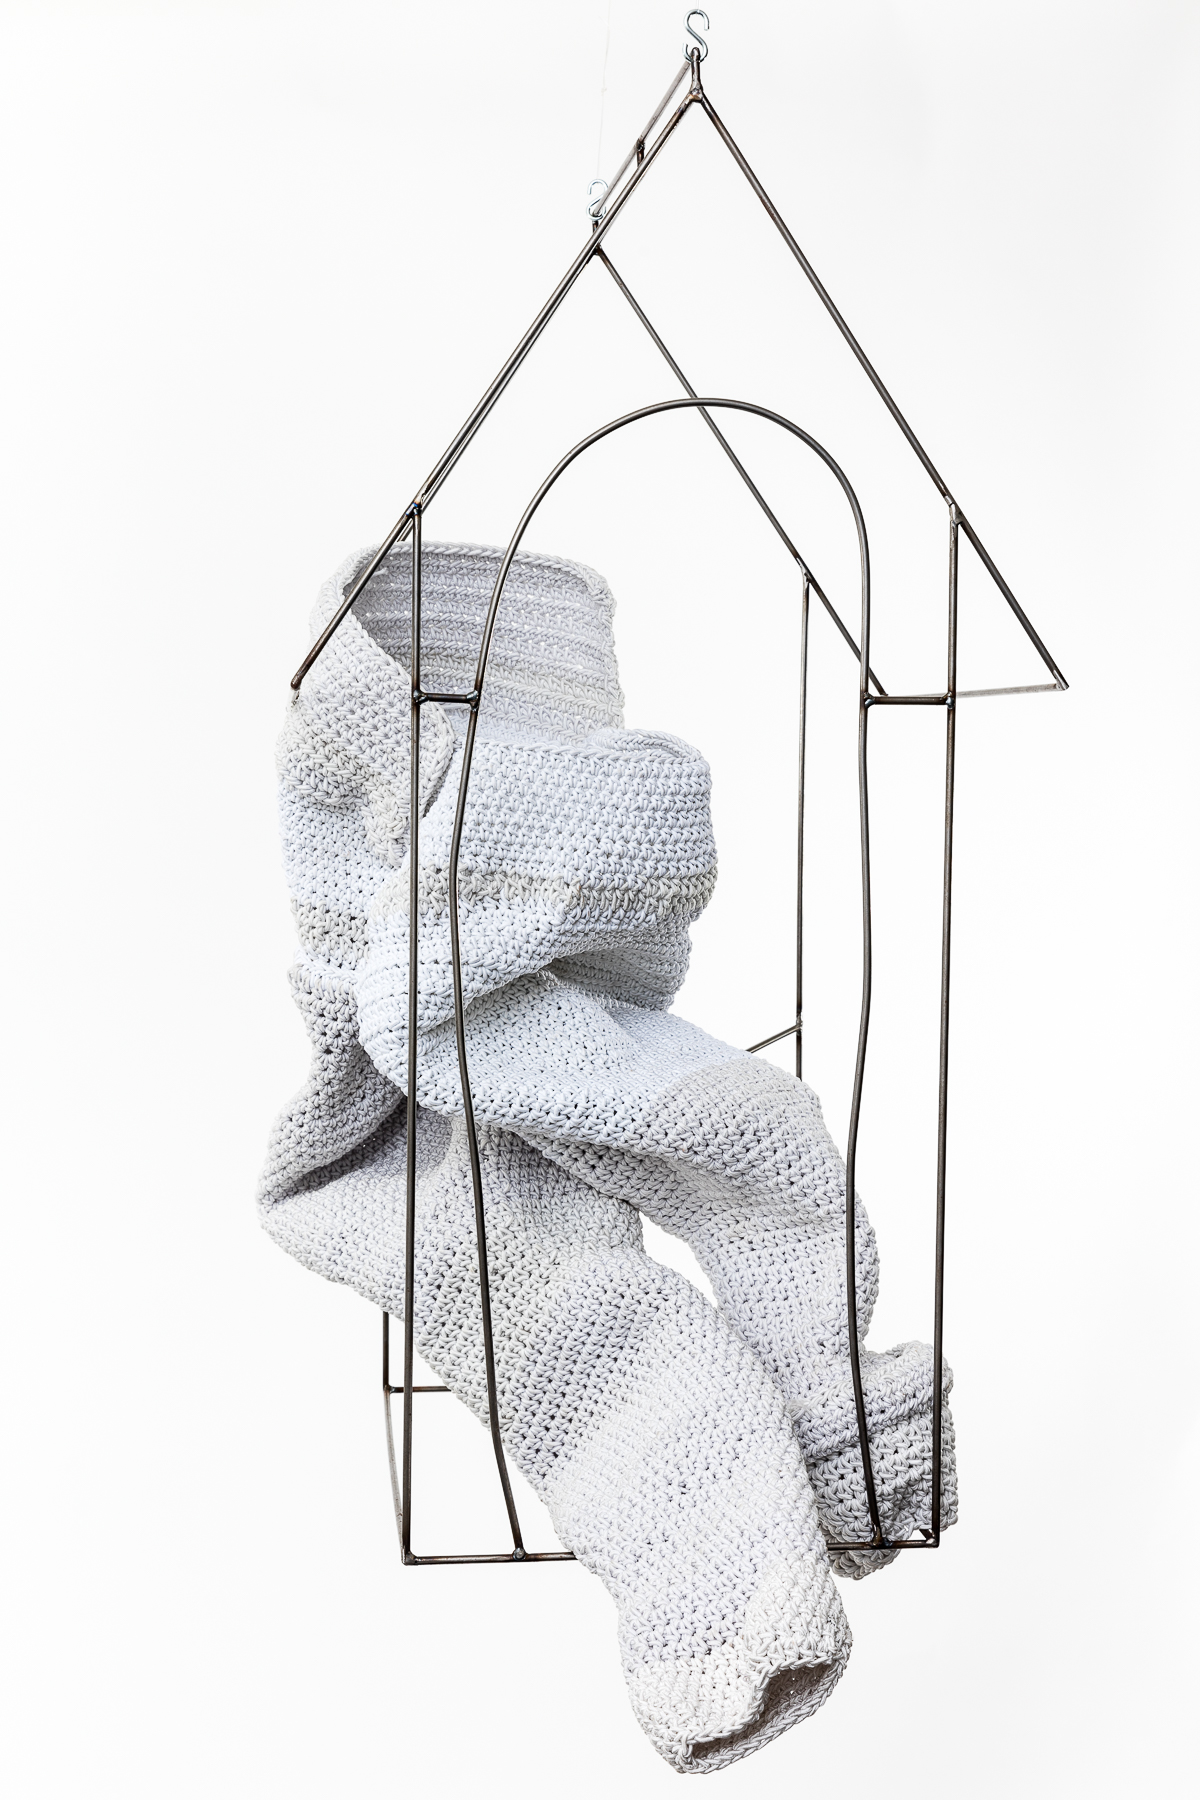 _DS_0177_Claudia-Maria Luenig_Skulpturen_web.jpg